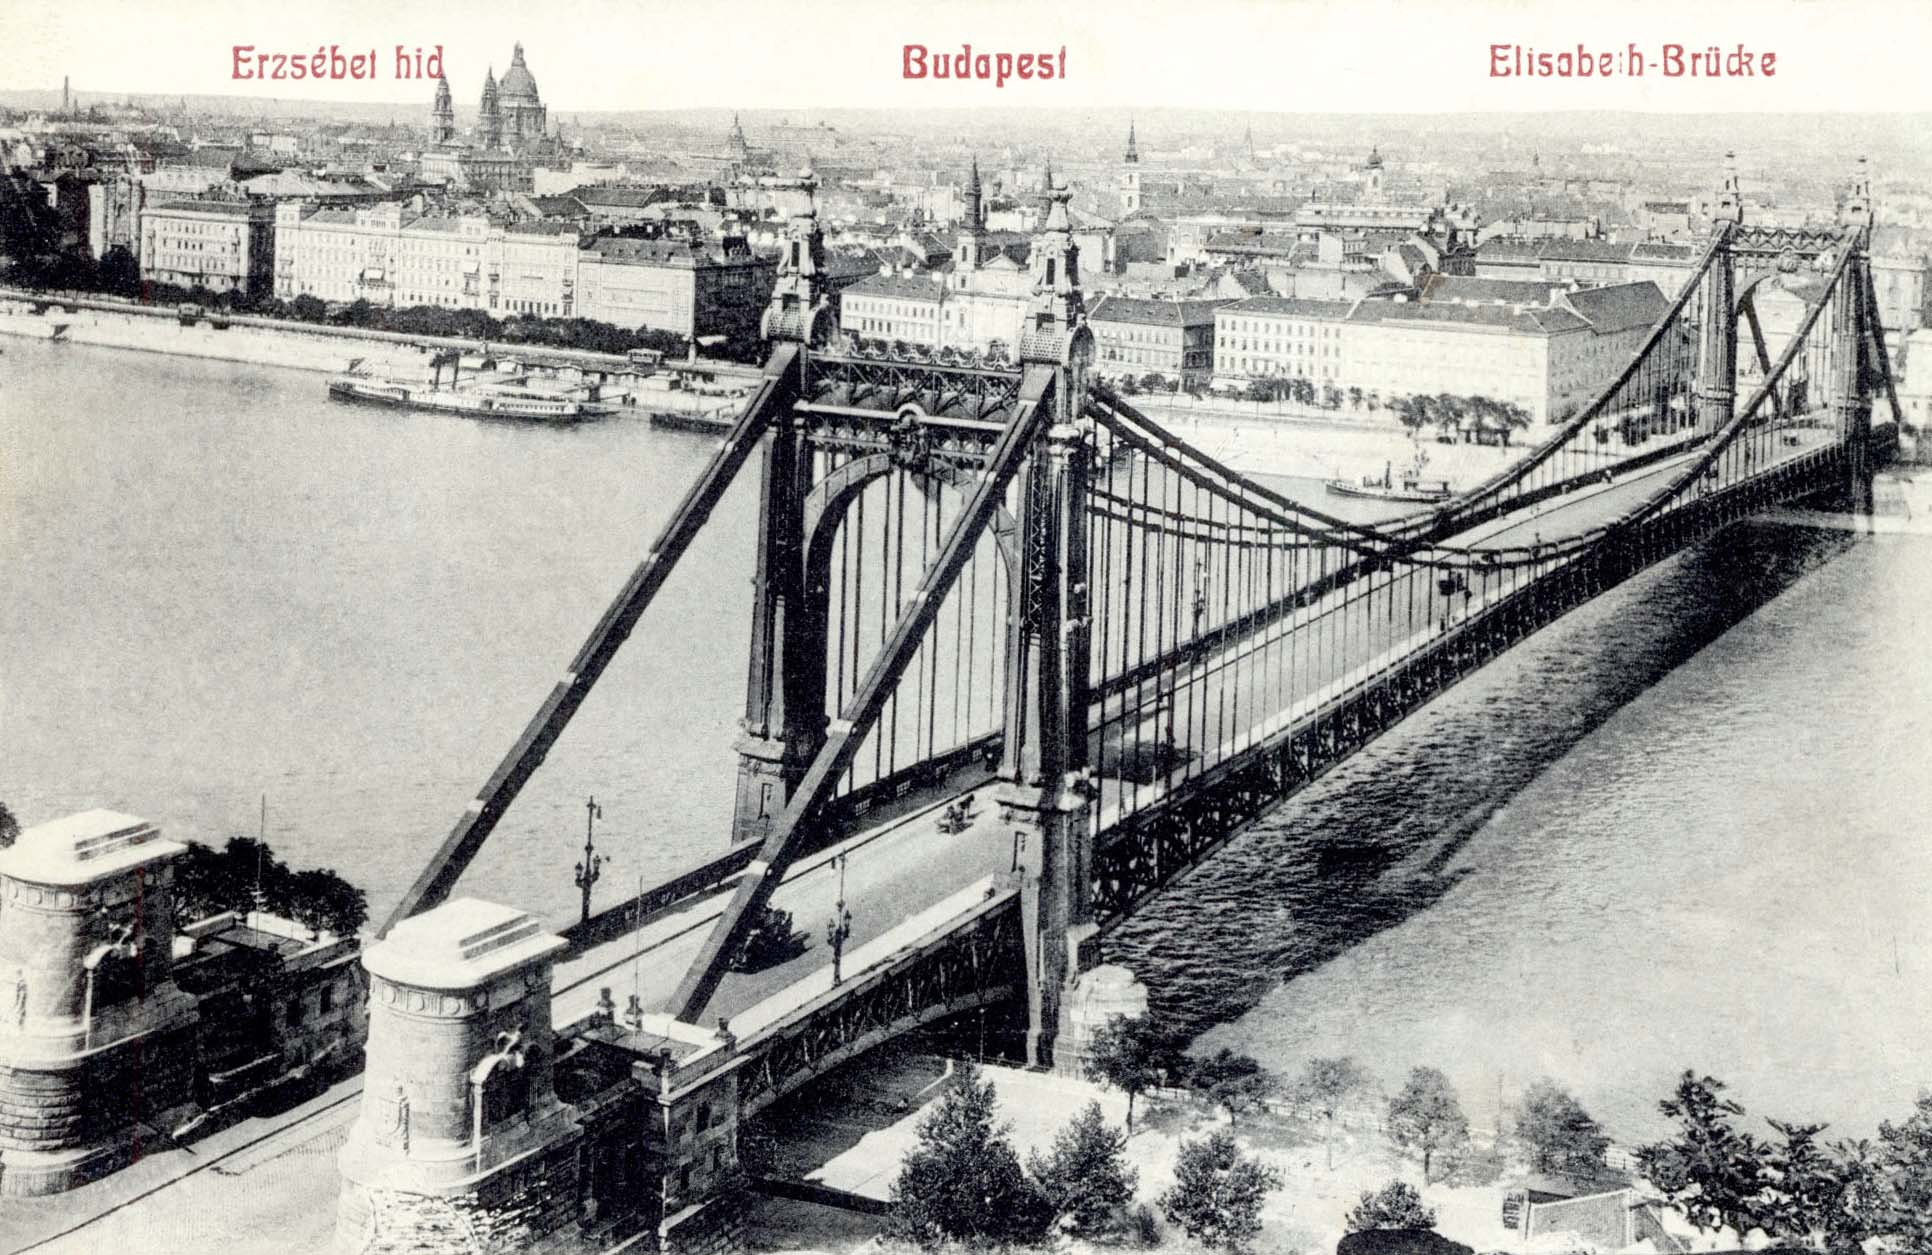 budapest_regi_erzsebet_hid_1907.jpg